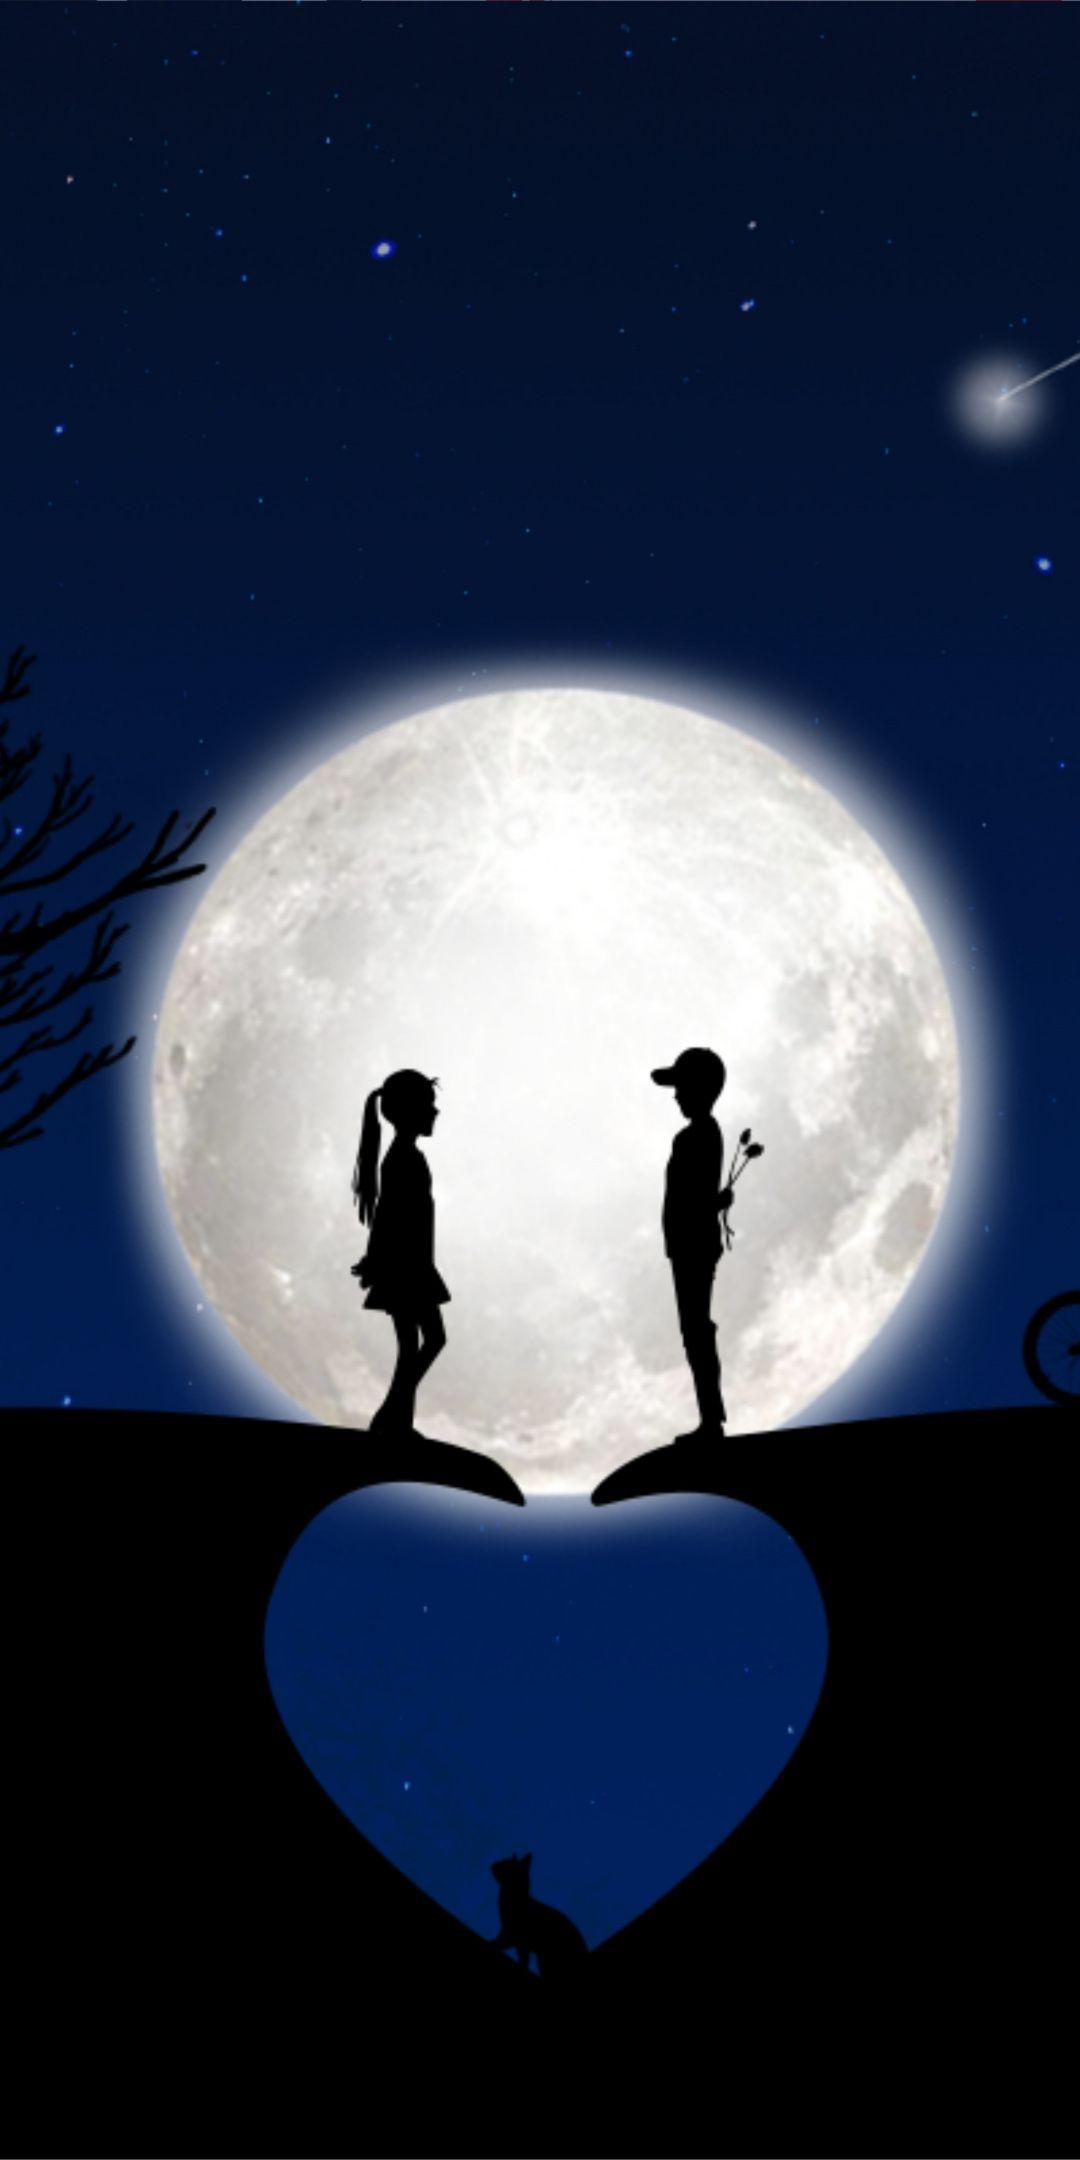 Heart Moon Couple Silhouette Art 1080x2160 Wallpaper Love Wallpapers Romantic Love Wallpaper Backgrounds Love Couple Wallpaper